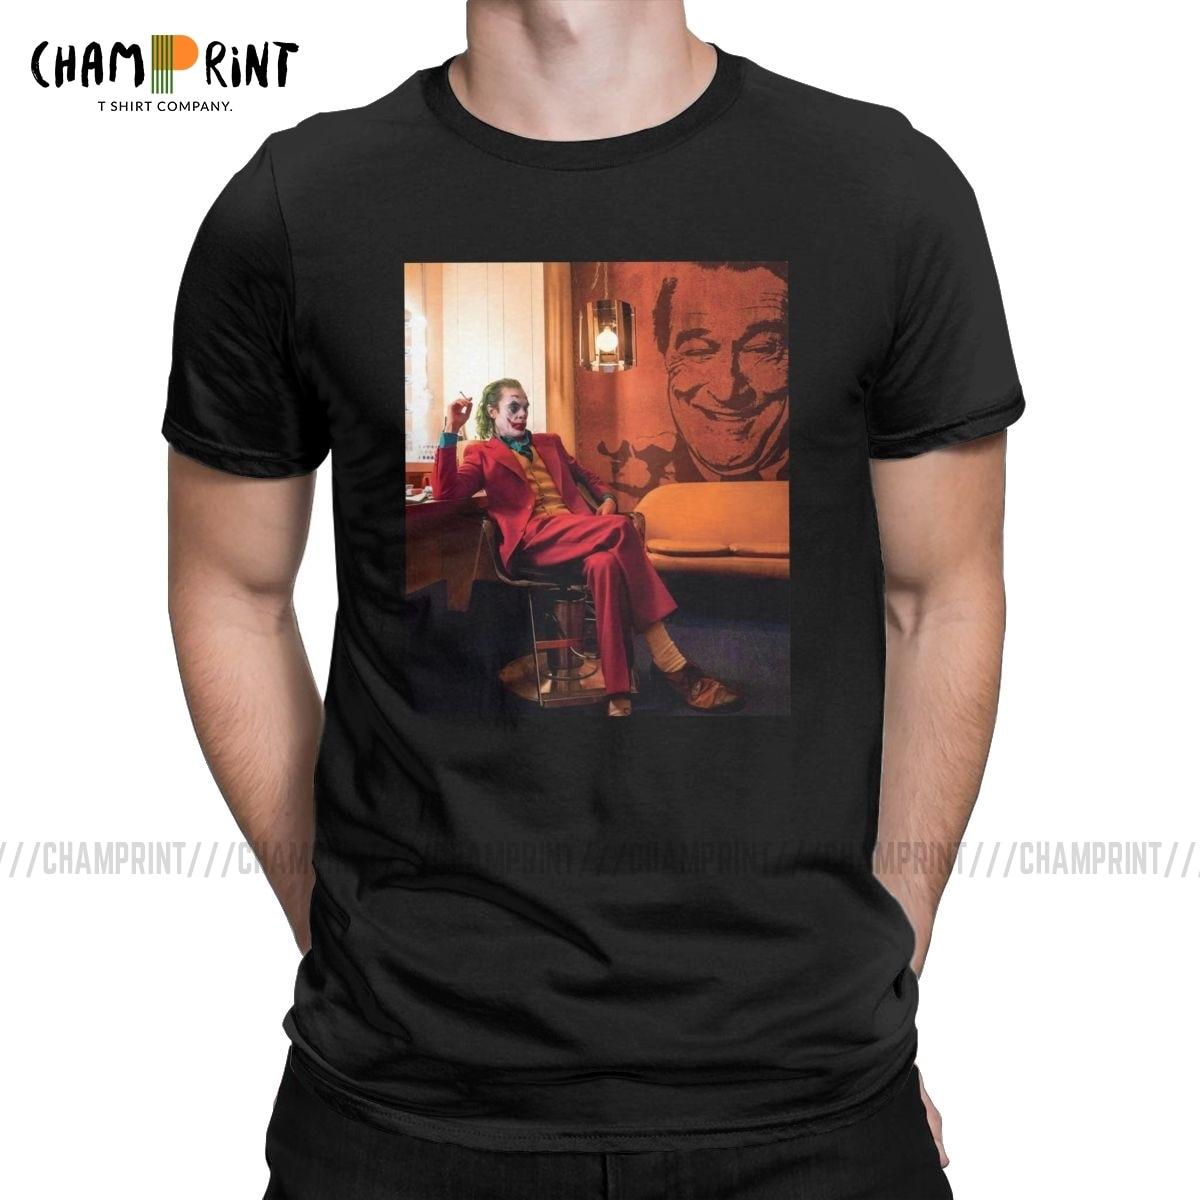 Funny Awesome Joker T-Shirt For Men Cotton T Shirt Joaquin Phoenix 2019 Movie Arthur Fleck Clown Short Sleeve Tees Summer Tops